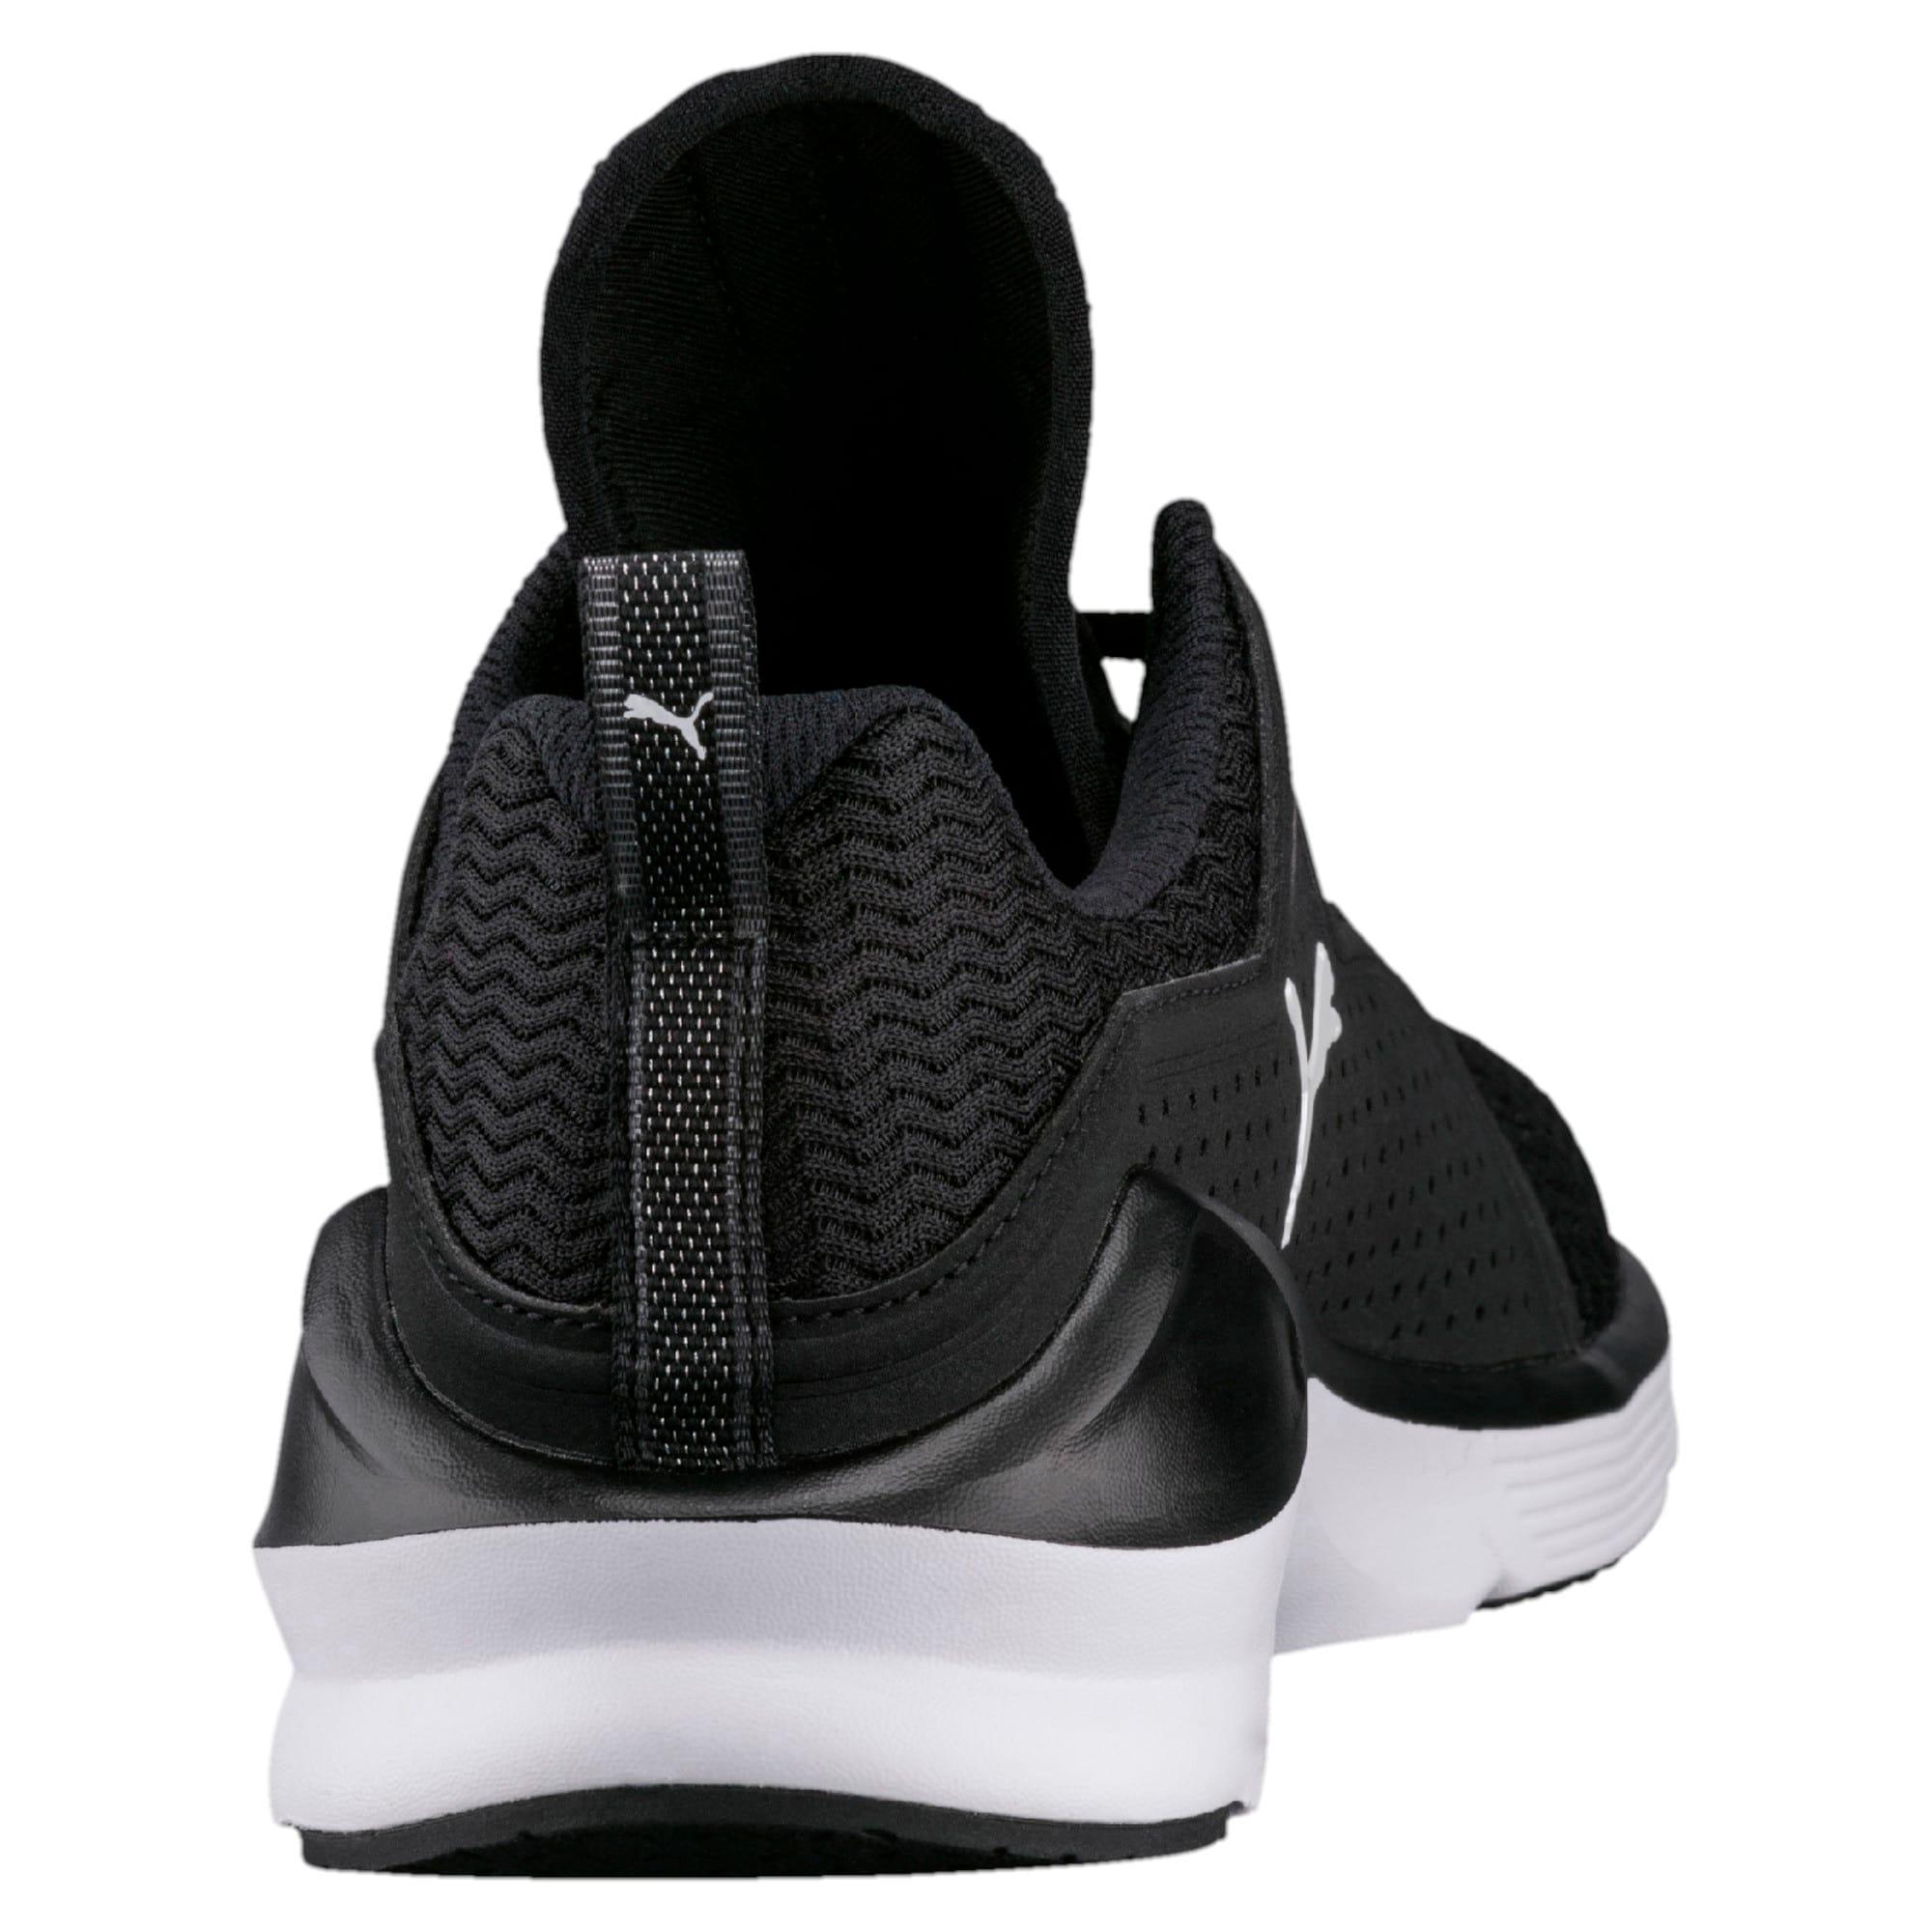 Thumbnail 3 of Fierce Lace Core Women's Training Shoes, Puma Black-Puma White, medium-IND